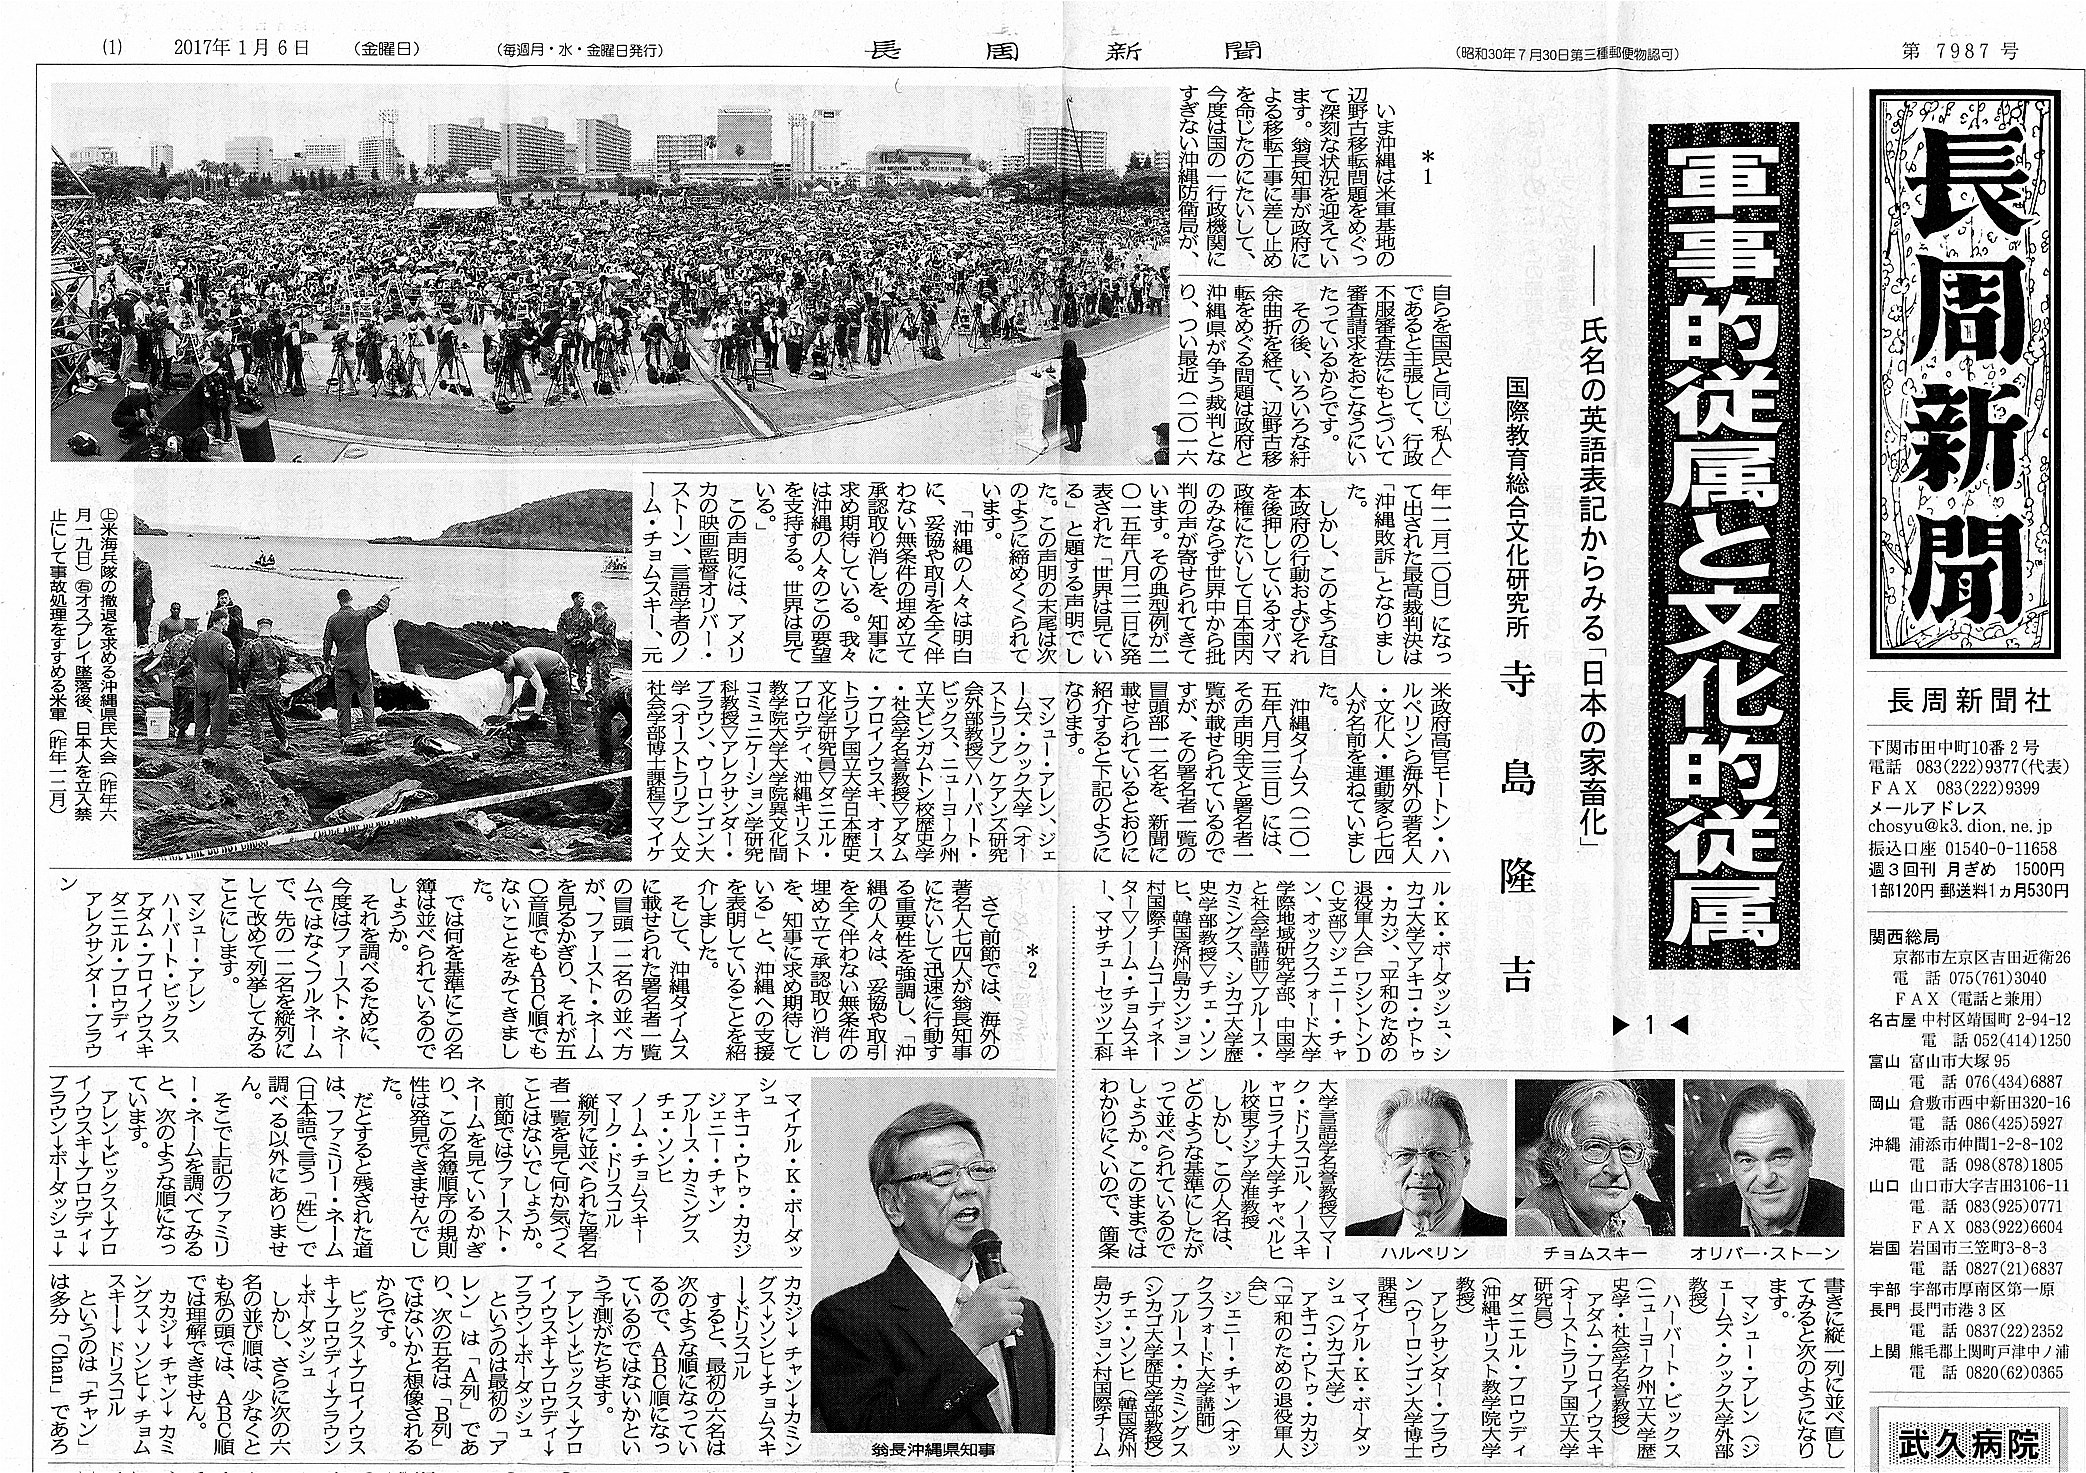 s-論文「軍事的従属と文化的従属」長周新聞20170106(1)